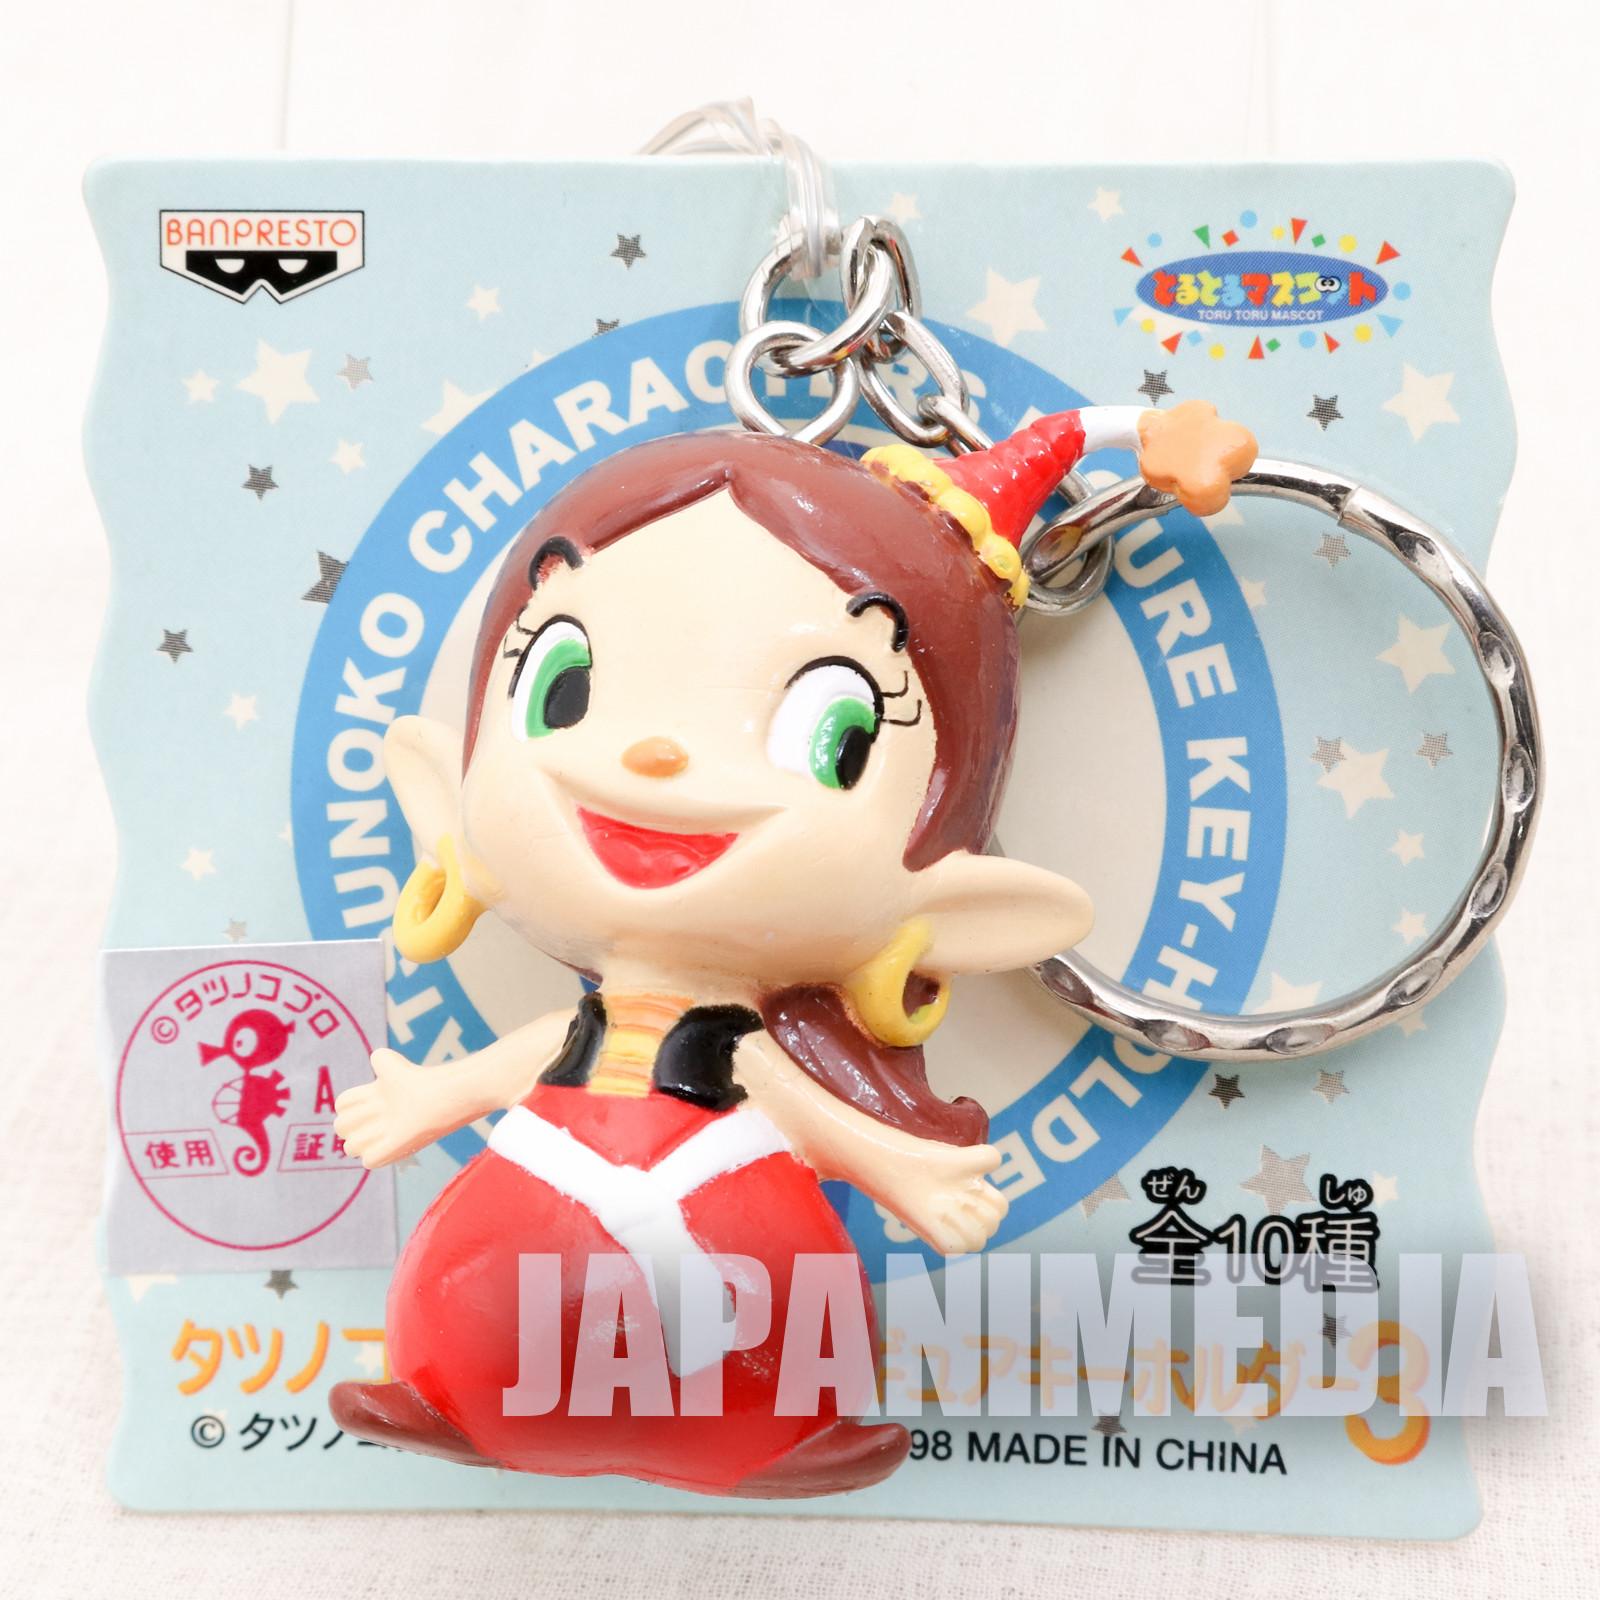 The Genie Family Akubi chan Joey Figure Key Chain Tatsunoko Pro JAPAN ANIME